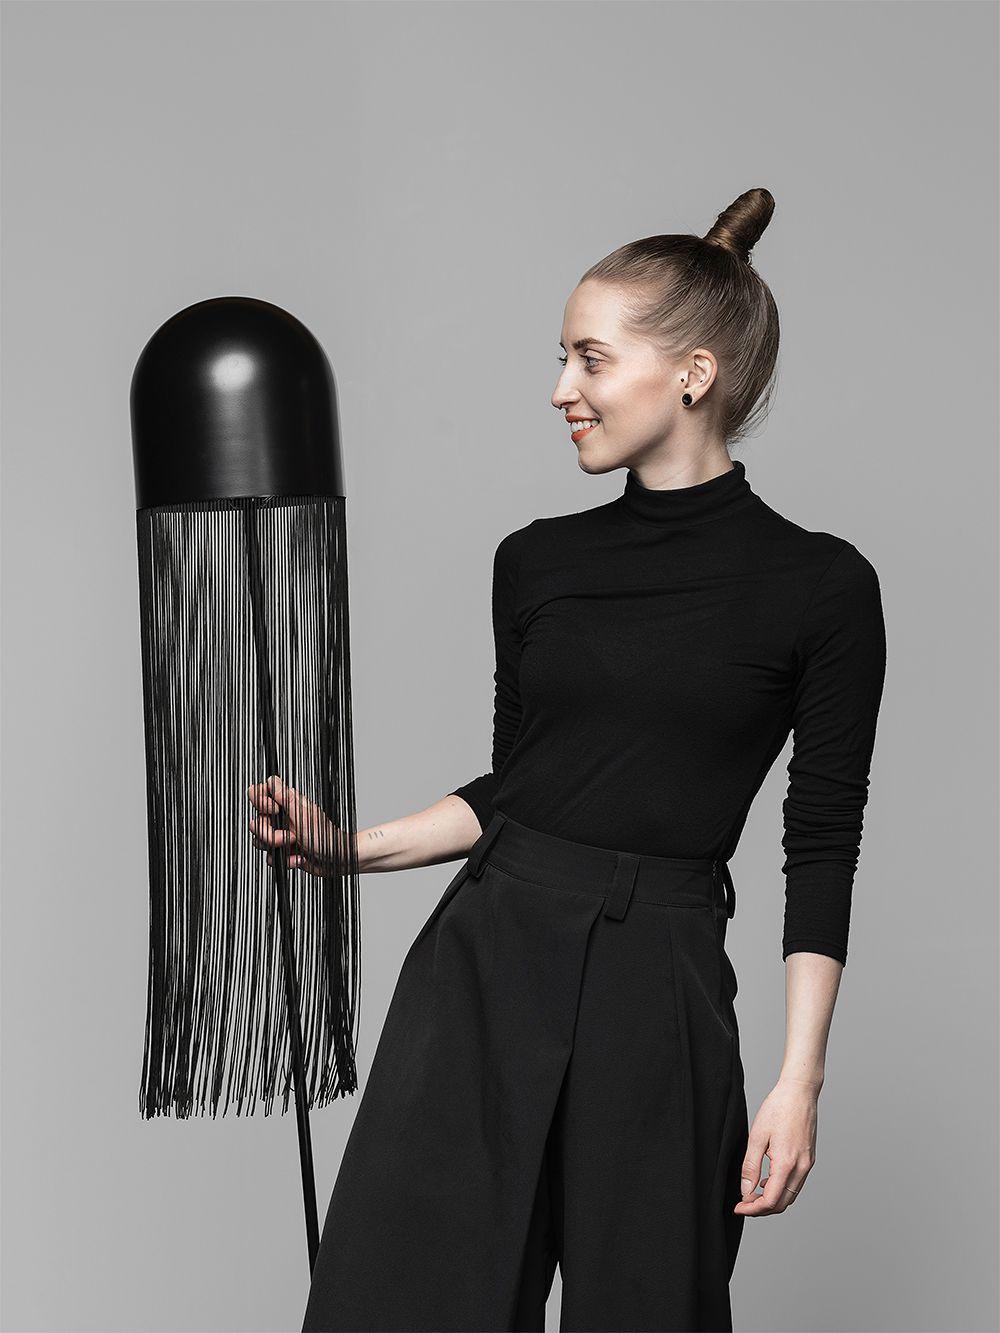 Hide floor lamp by Laura Väre